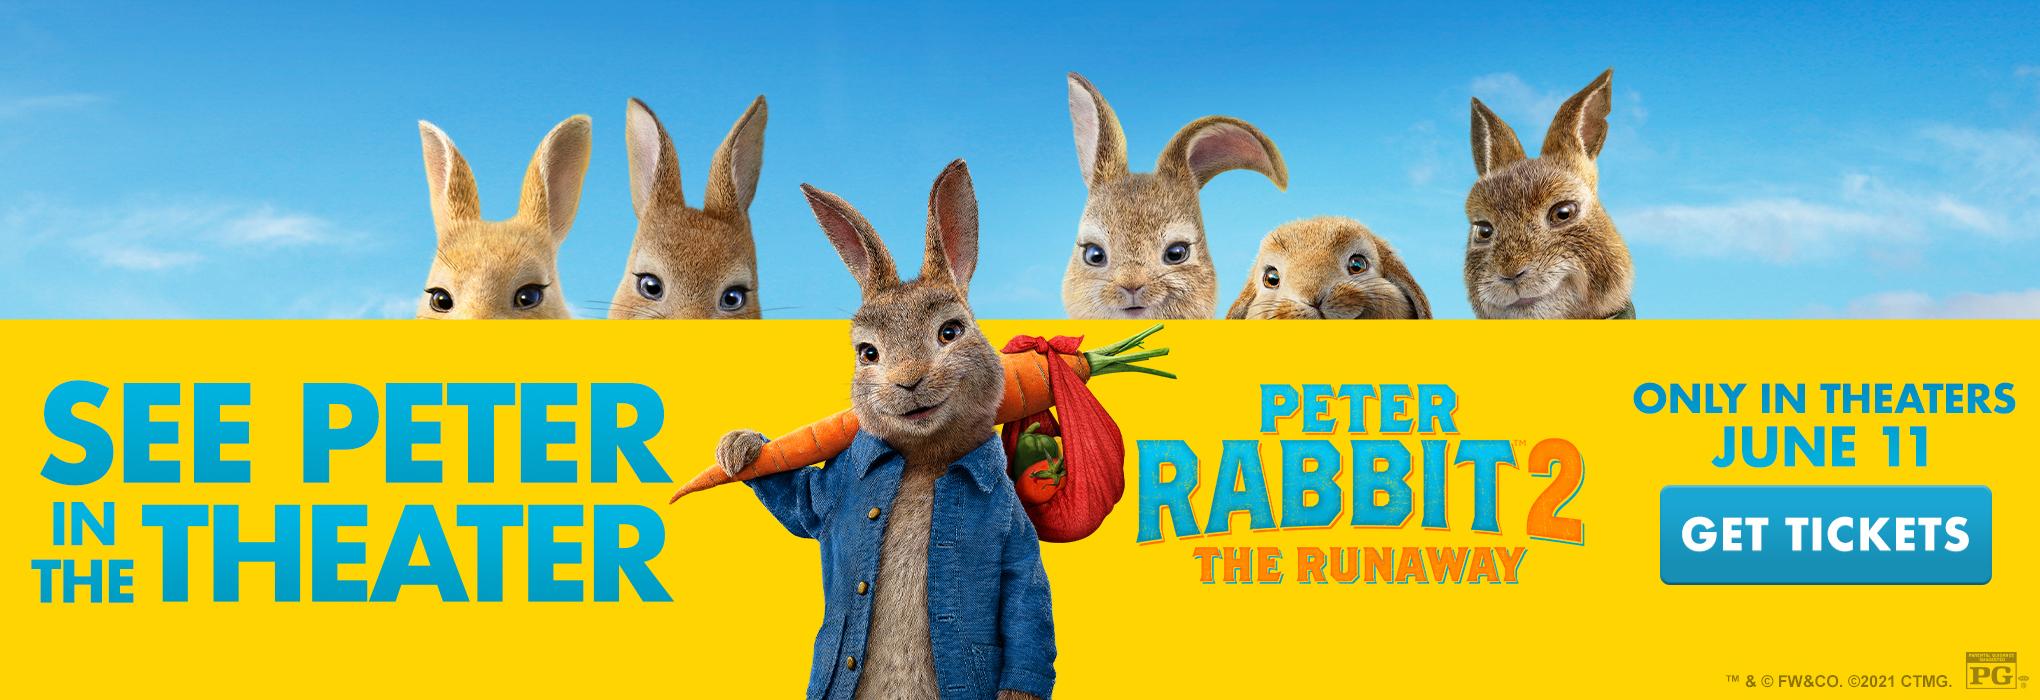 Slider image for Peter Rabbit 2: The Runaway